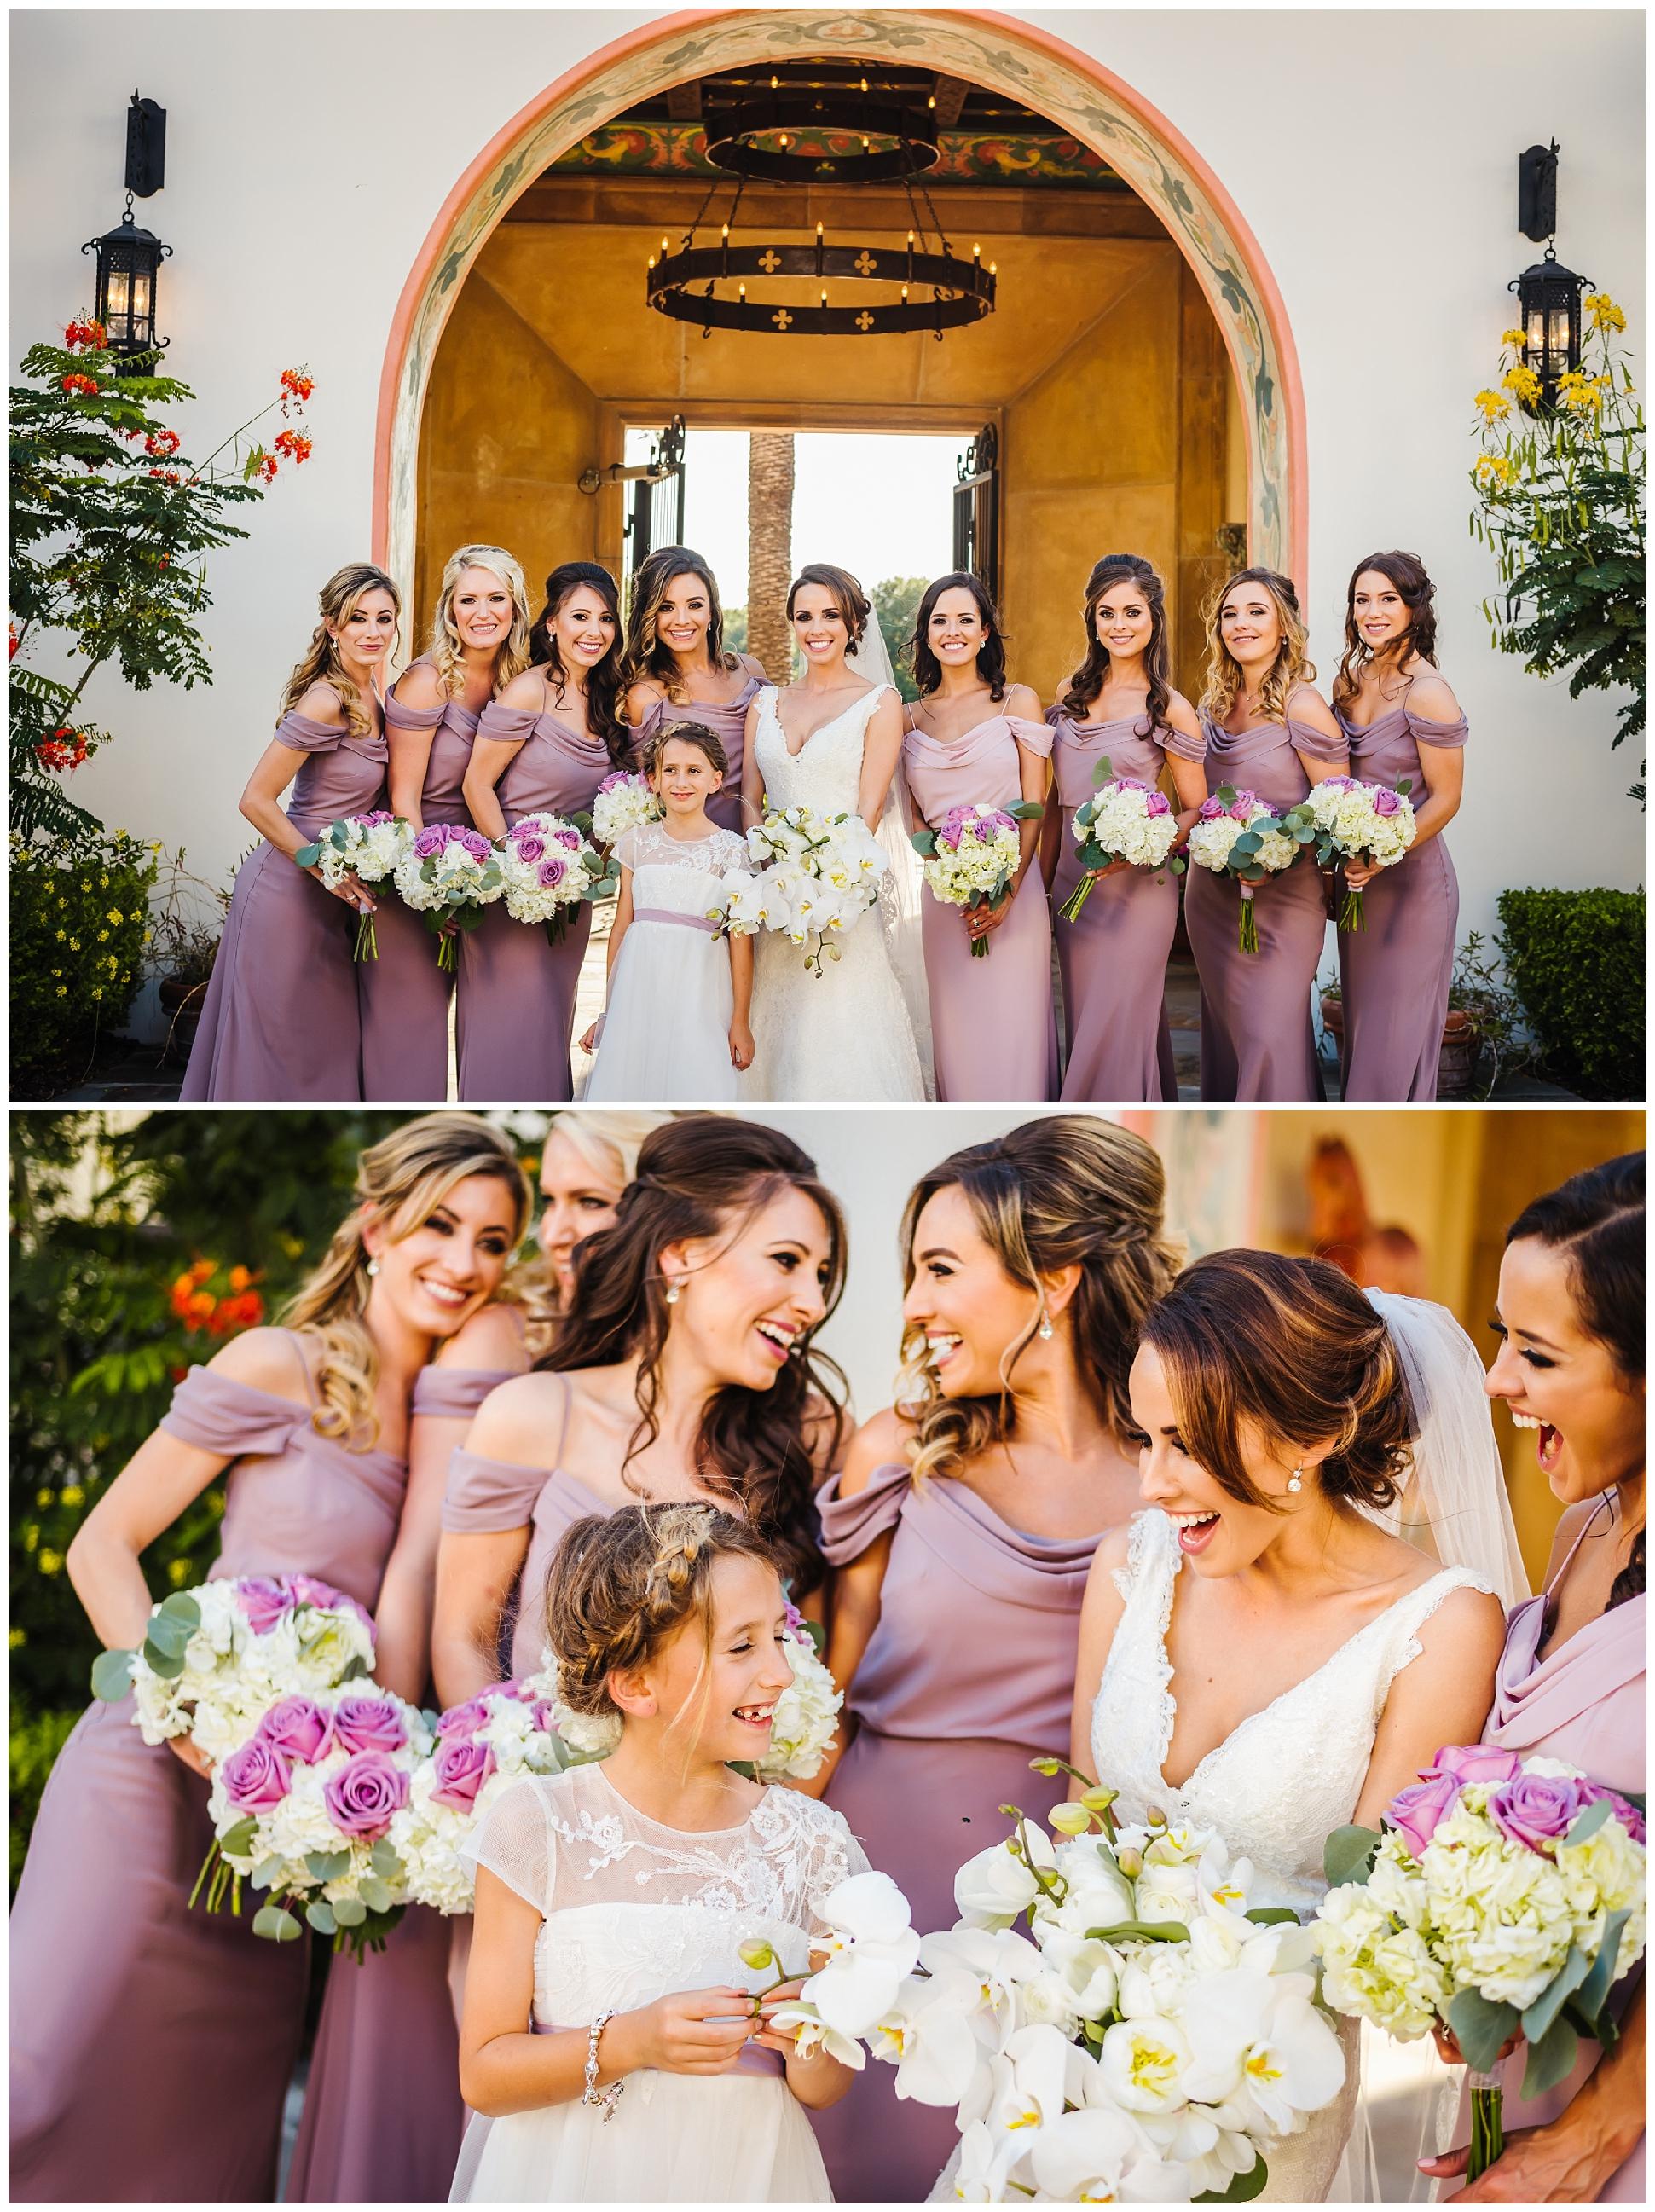 Tampa-luxury-wedding-photographer-mision-lago-private-estate_0034.jpg